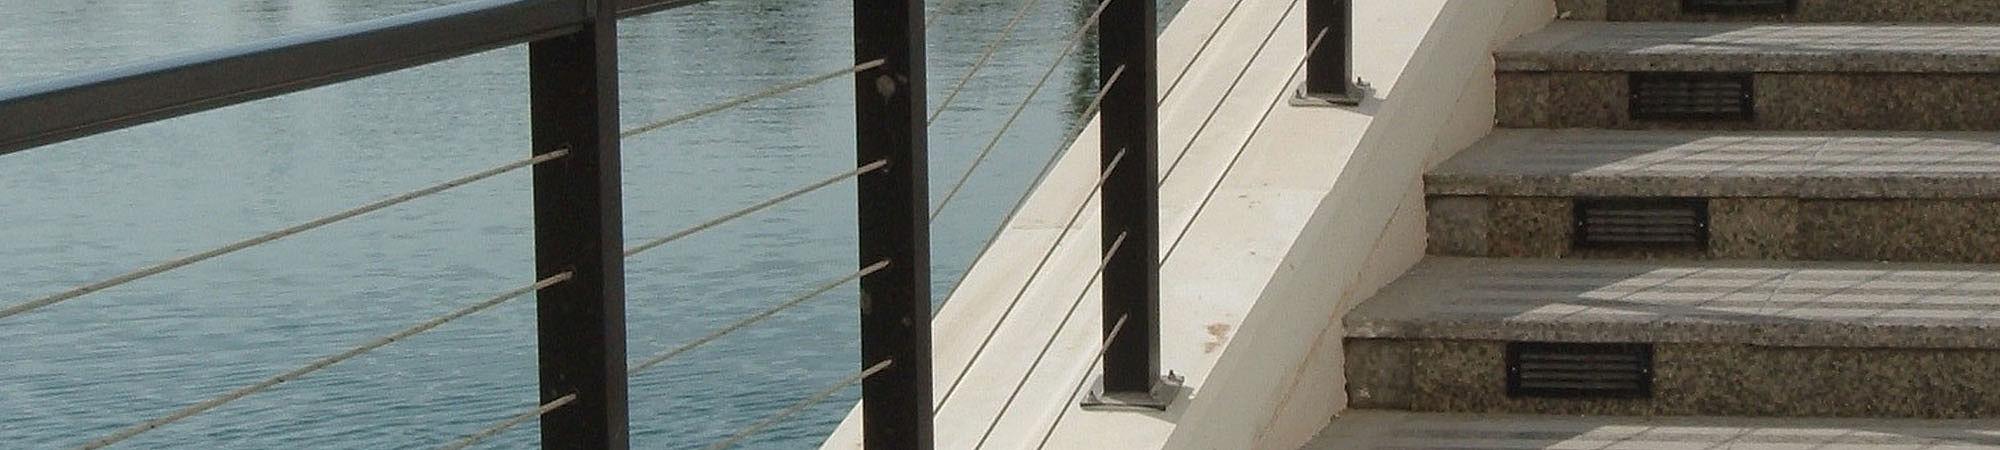 Geländerfüllung Brückengeländer I-SYS Edelstahlseile